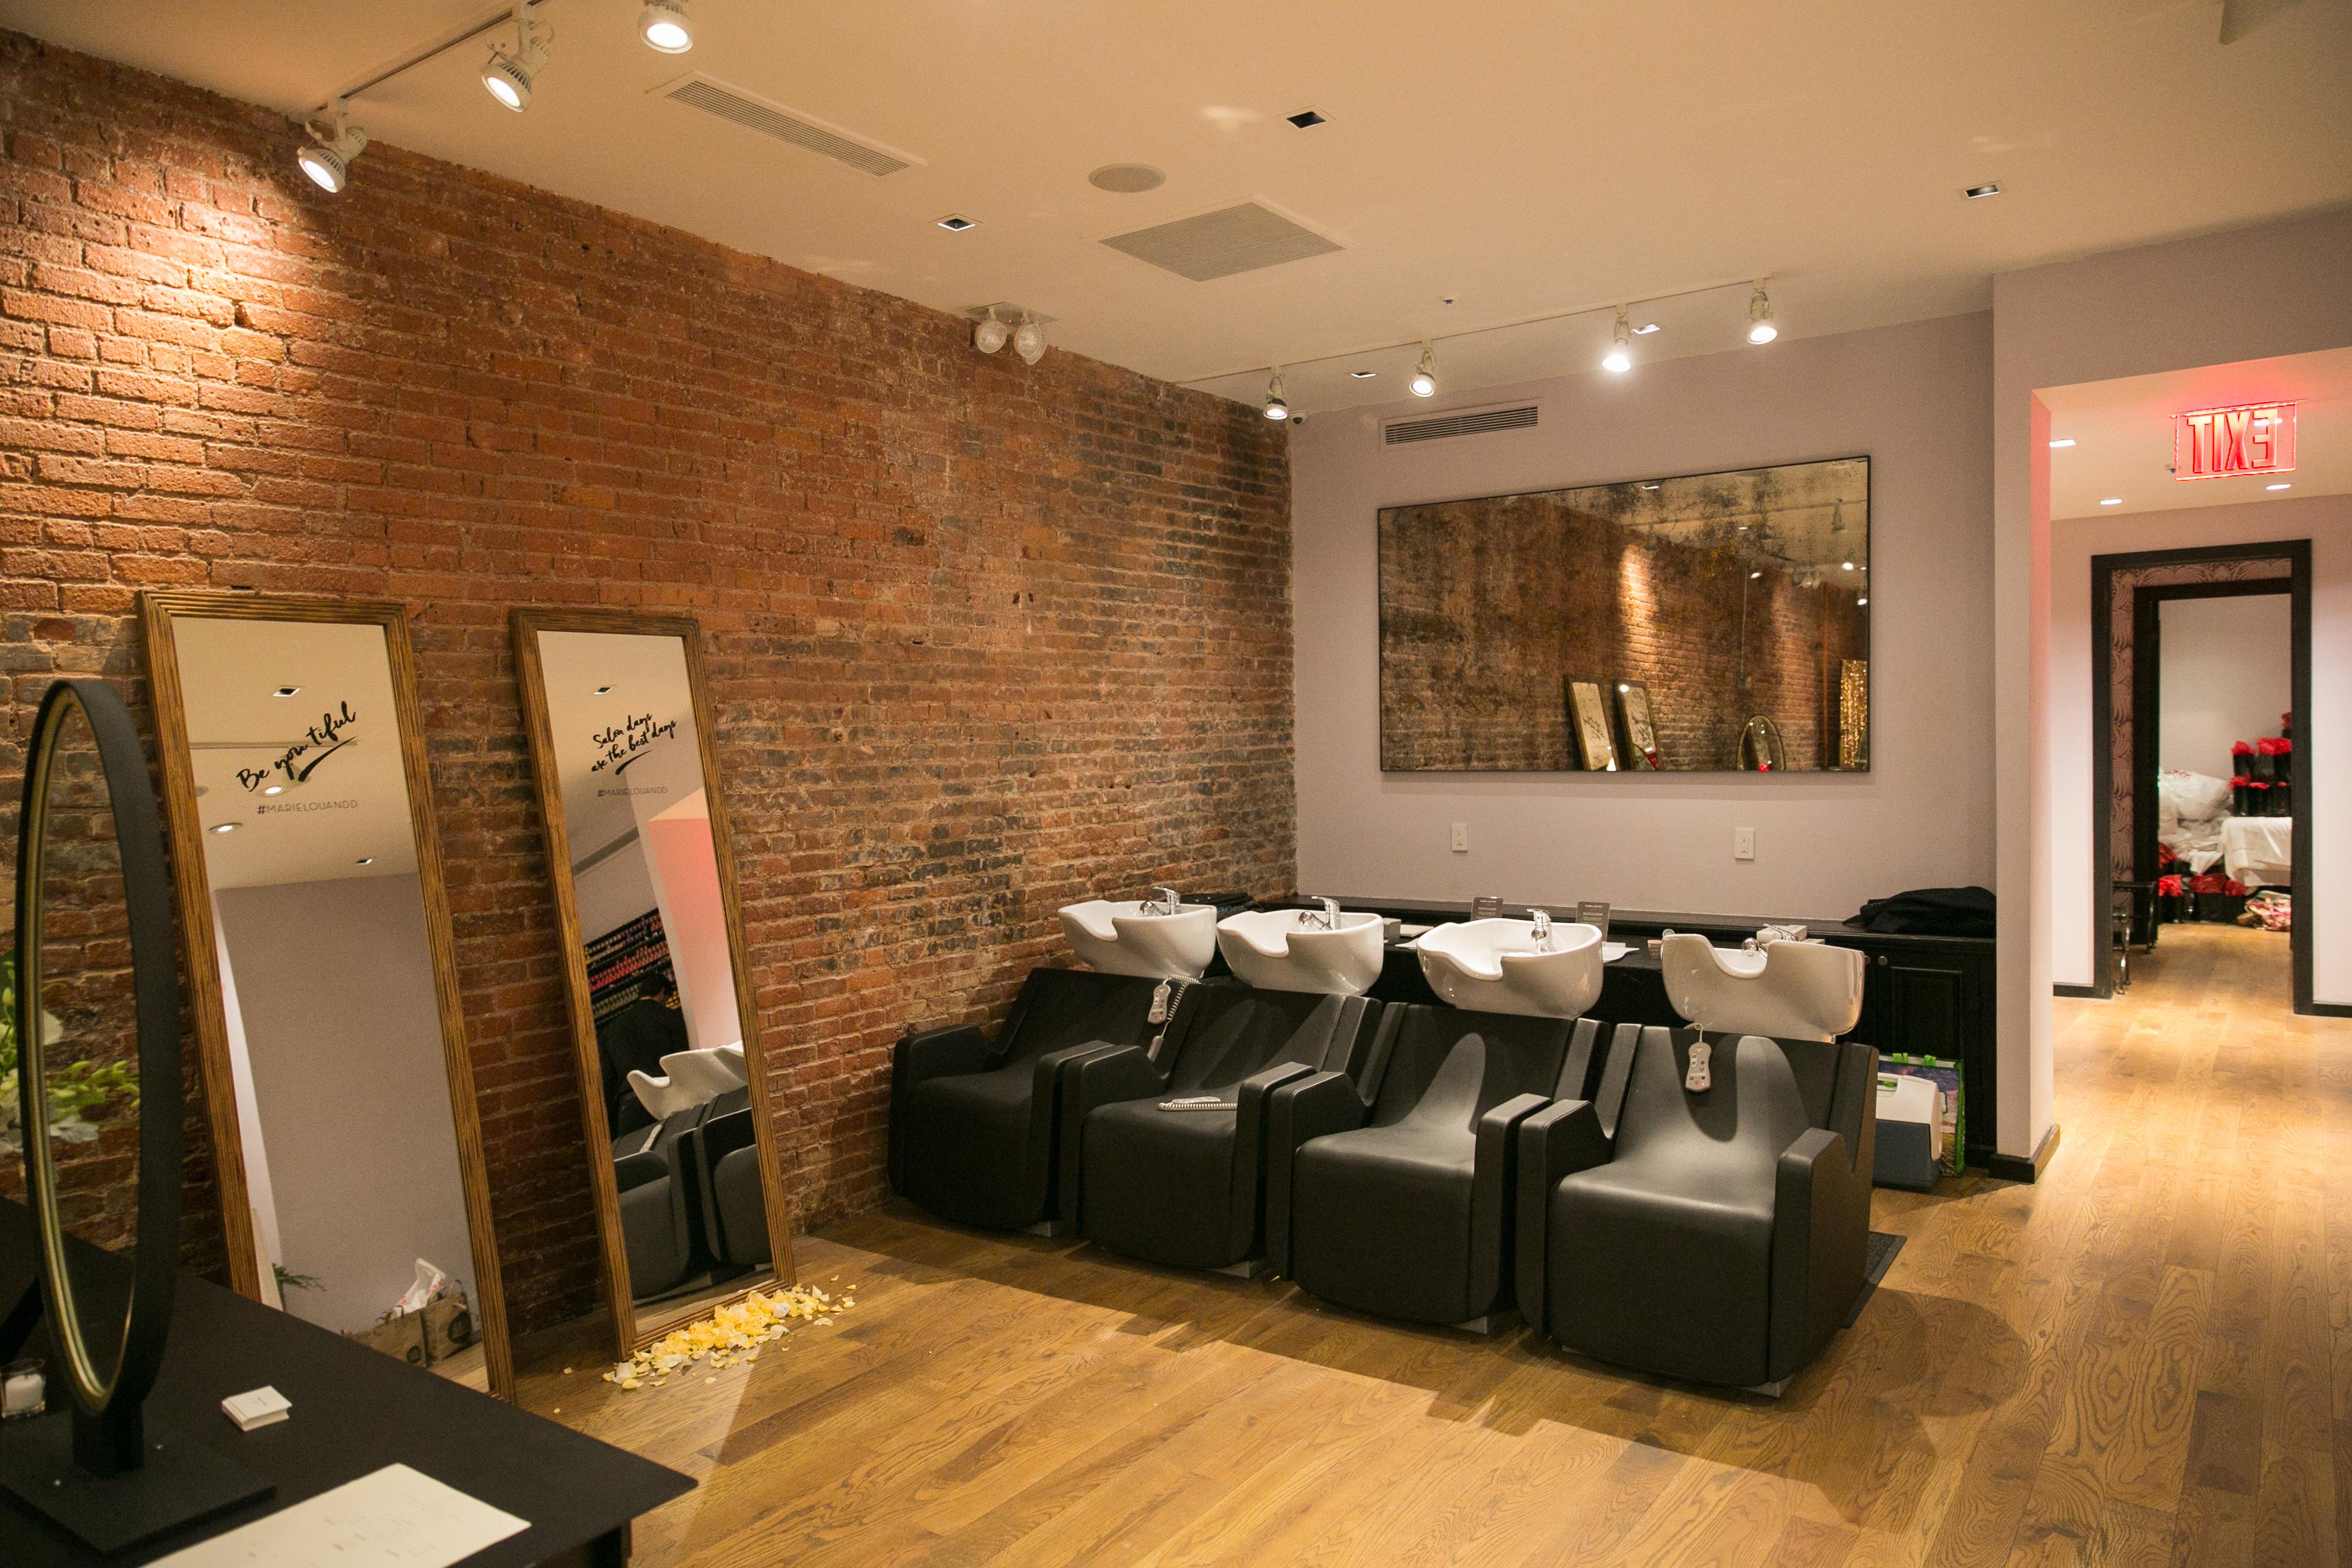 spot salon elegant exemple salon amazing exemple de salon salle a manger spots led superbe spot. Black Bedroom Furniture Sets. Home Design Ideas